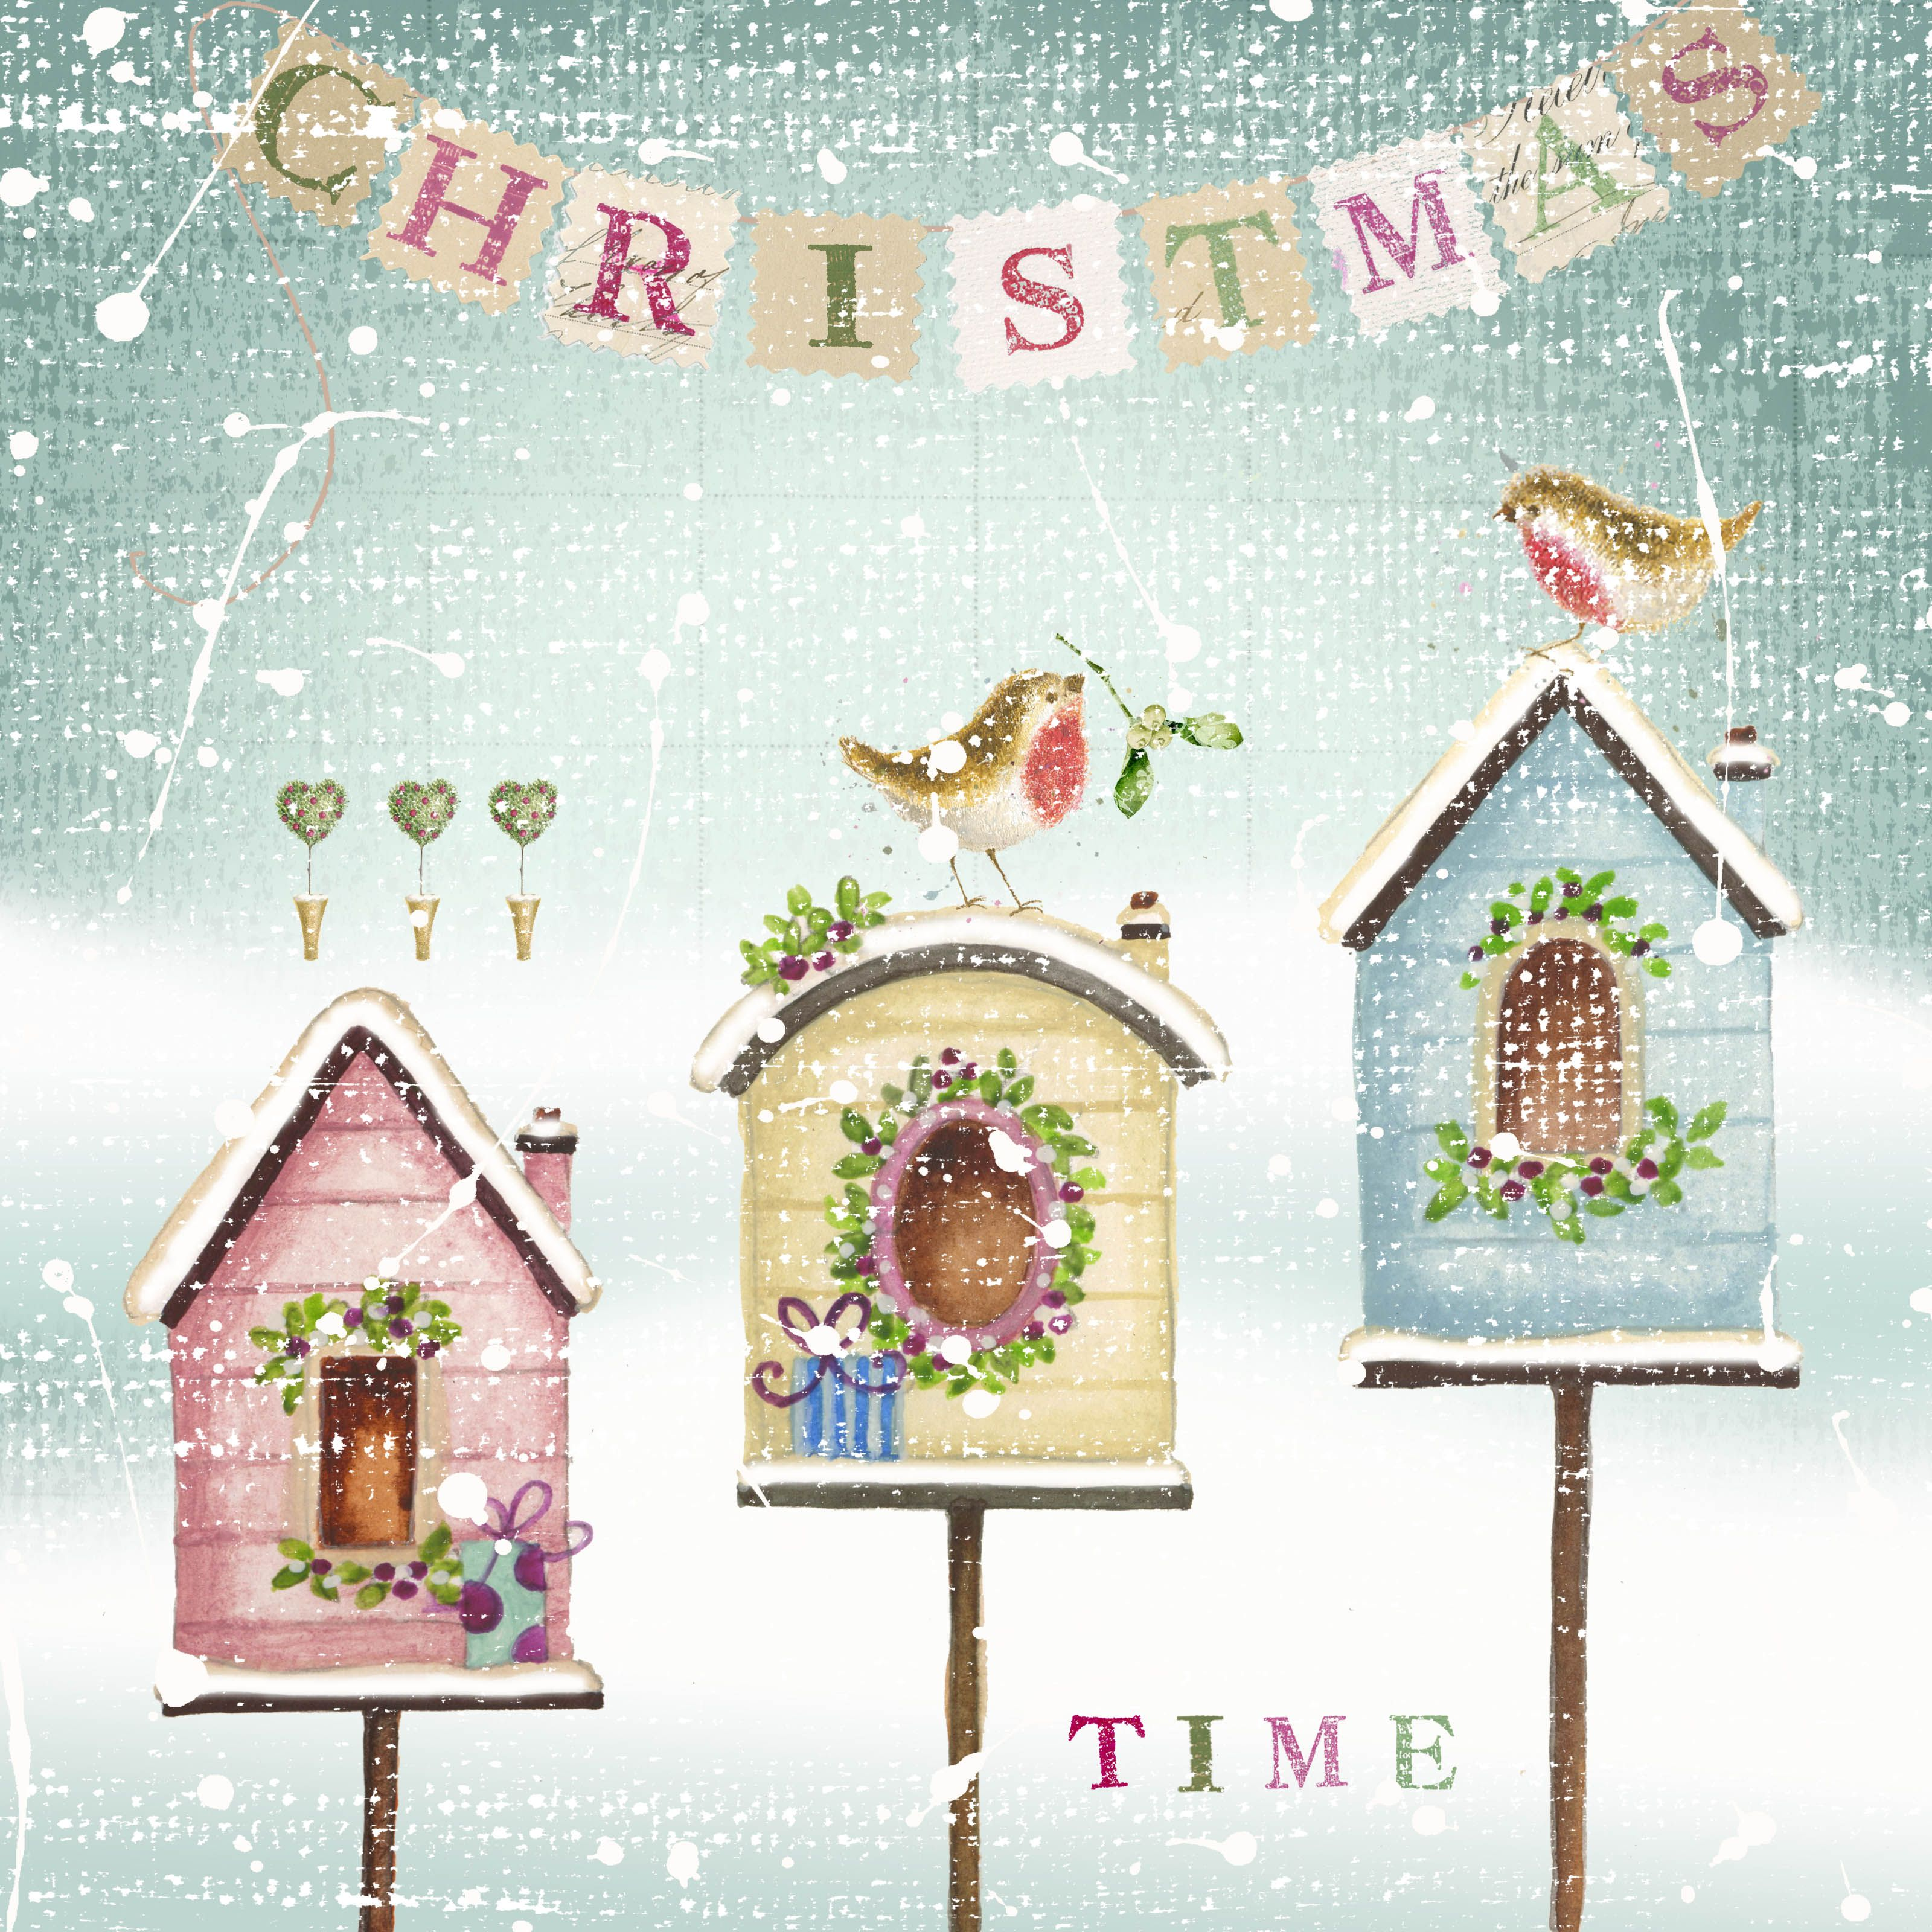 Christmas Greeting Card Design By Nicola Jane Rabbett These